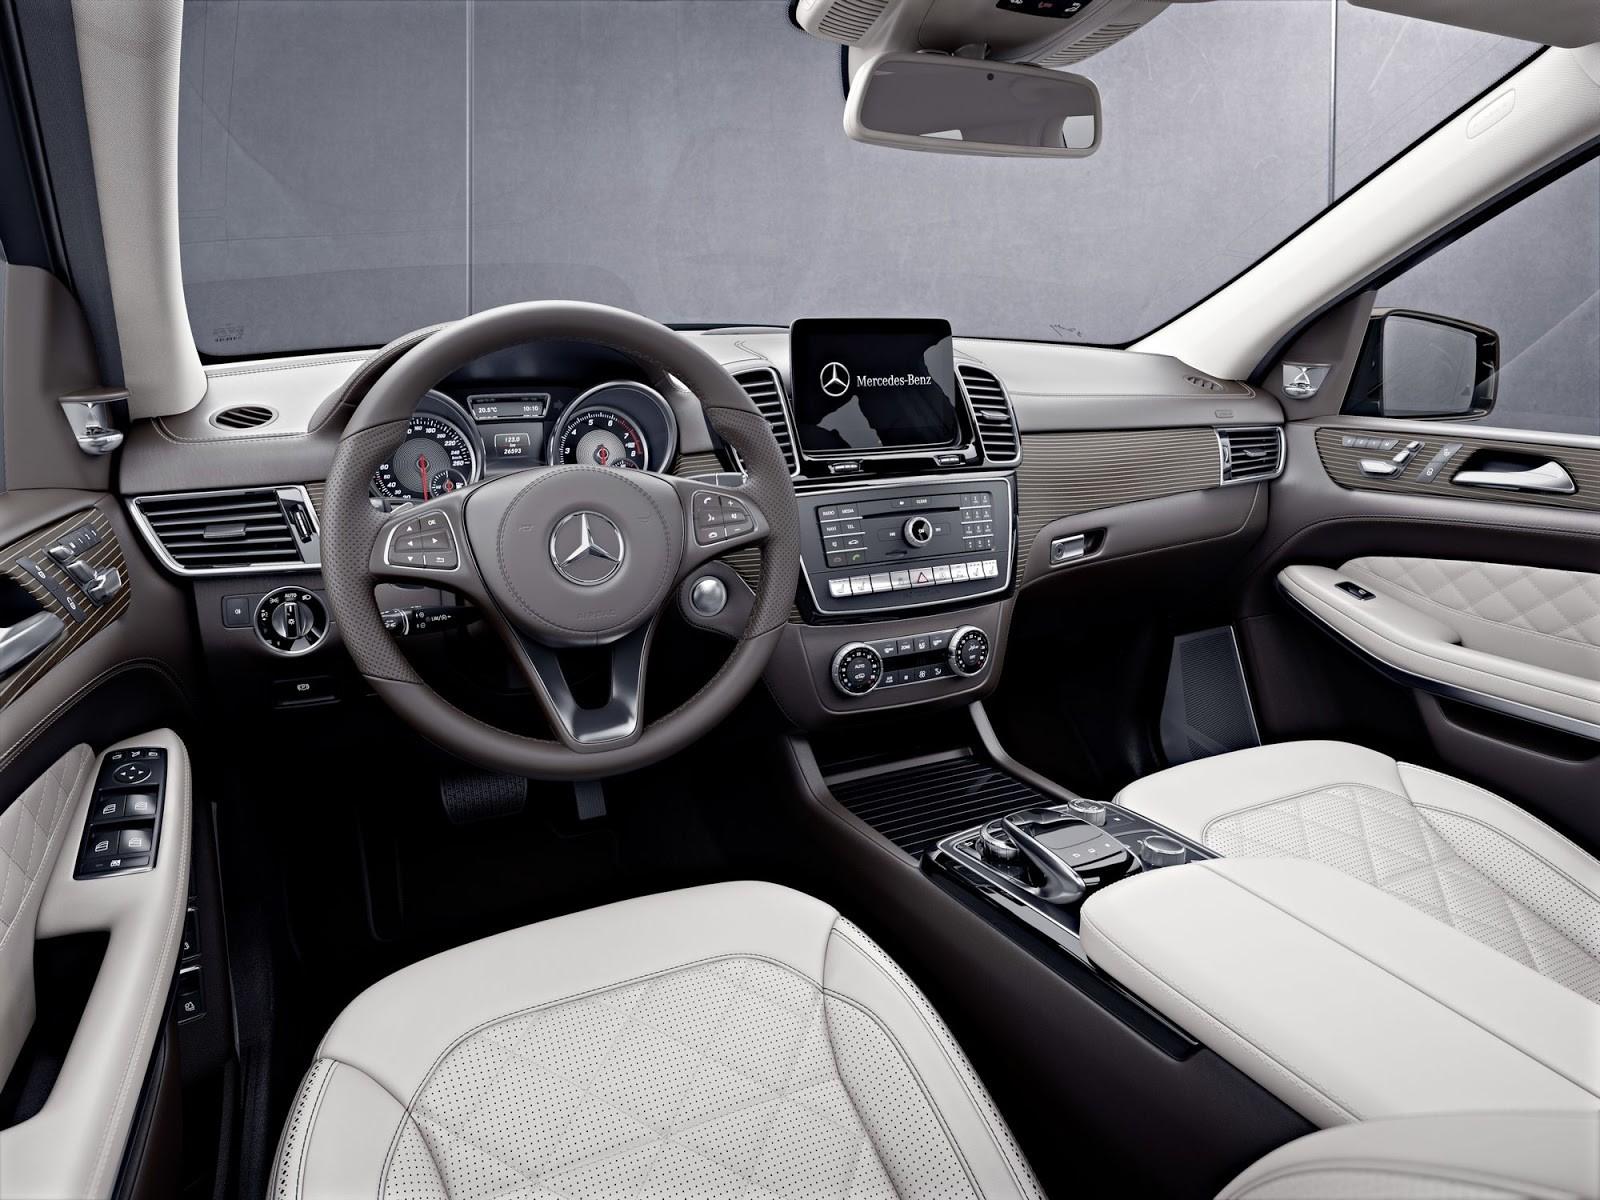 Mercedes представил версию Grand Edition Мерседес Бенс GLS